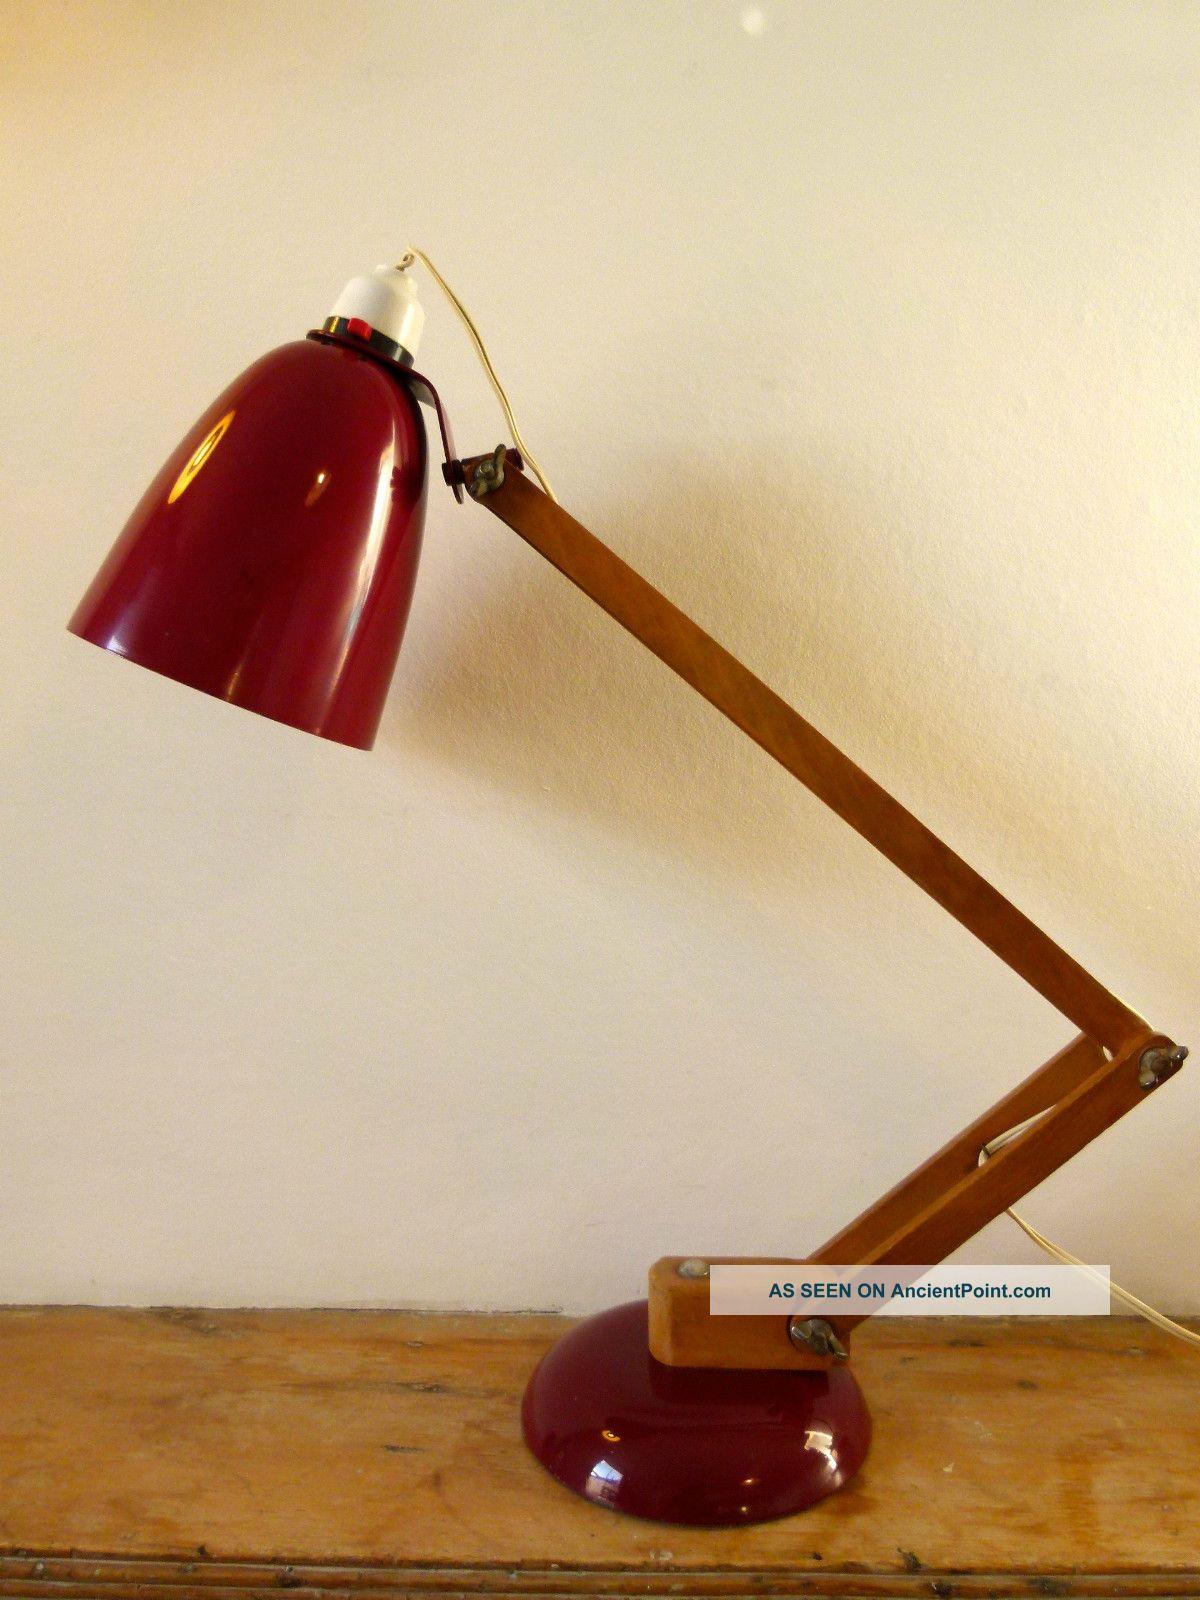 Vintage Retro Habitat Maclamp By Conran Wooden Arm 50s 60s Desk Table Lamp 20th Century photo